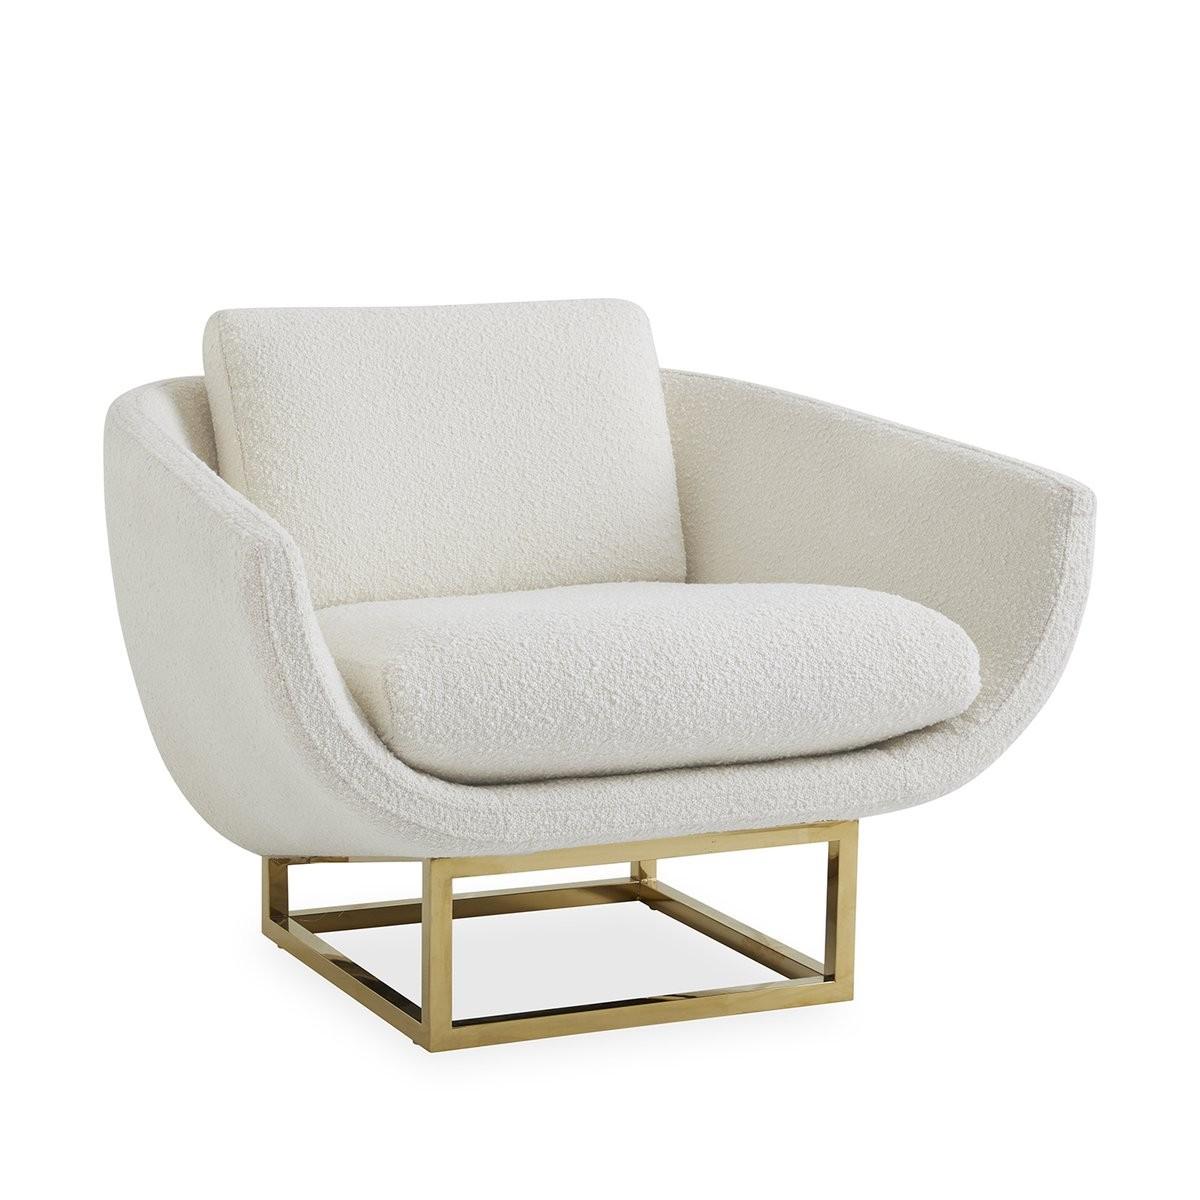 Jonathan Adler I Beaumont Lounge Chair I Olympus Ivory